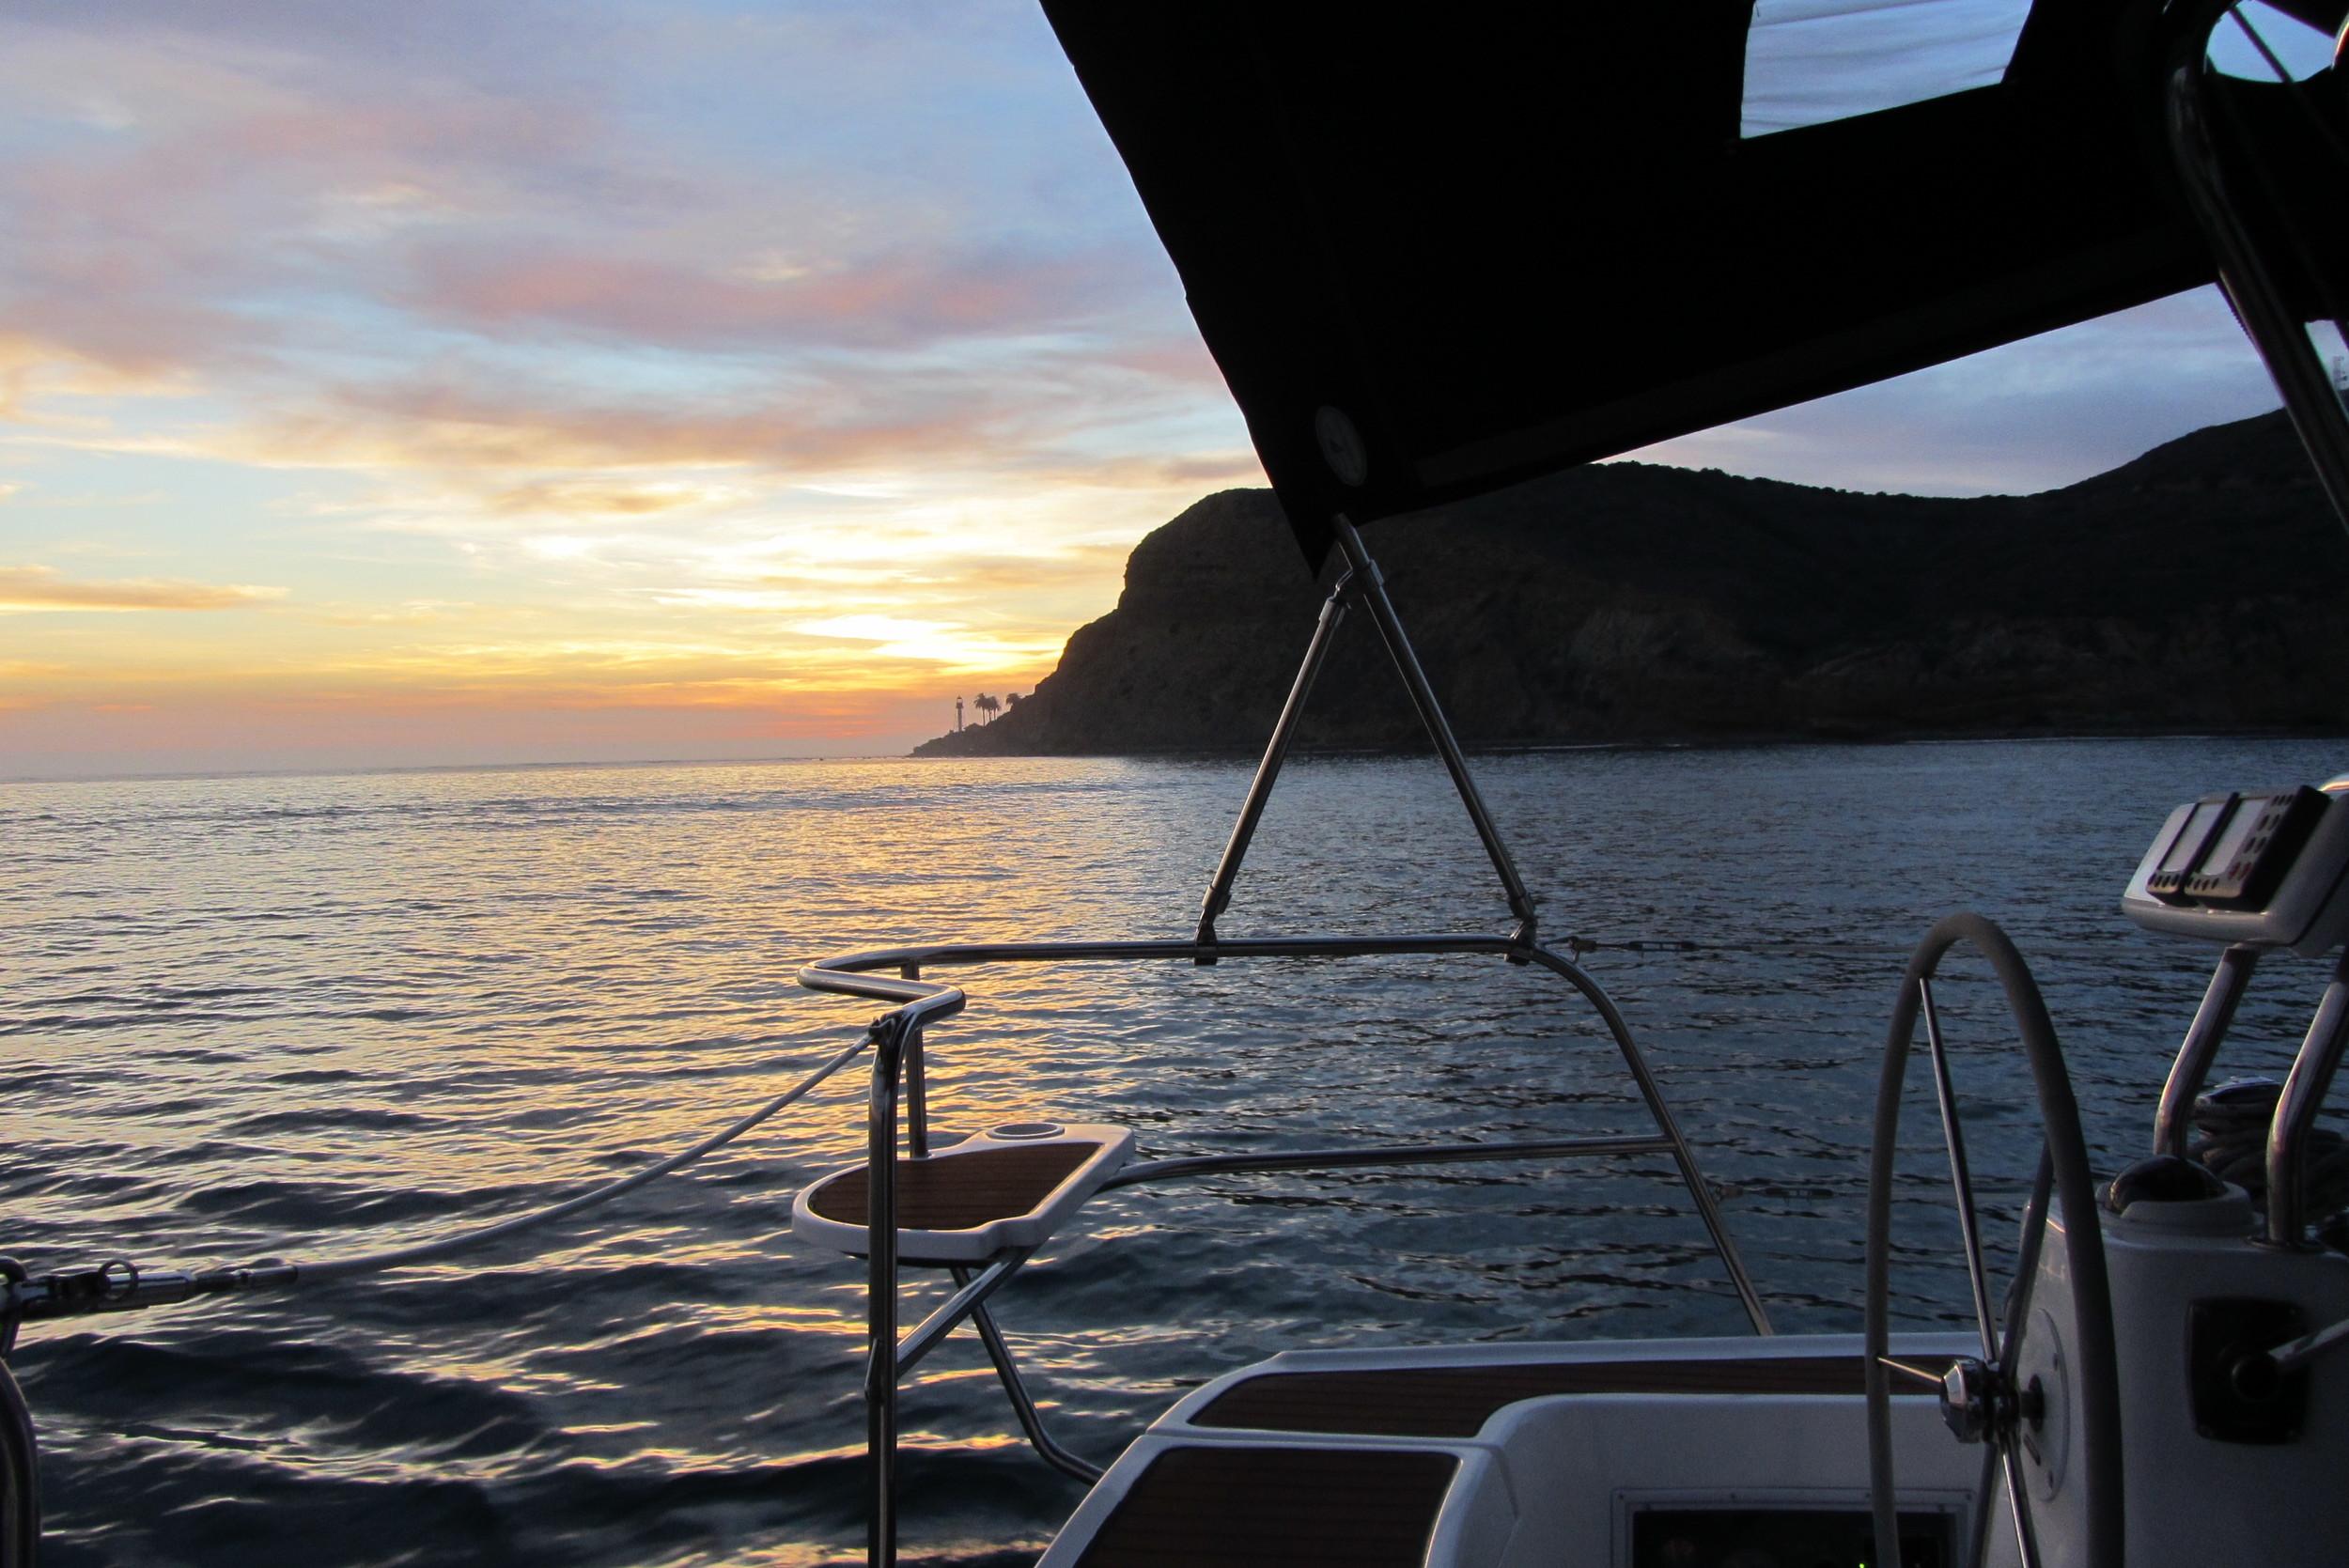 San Diego Sunset Sailing Point Loma